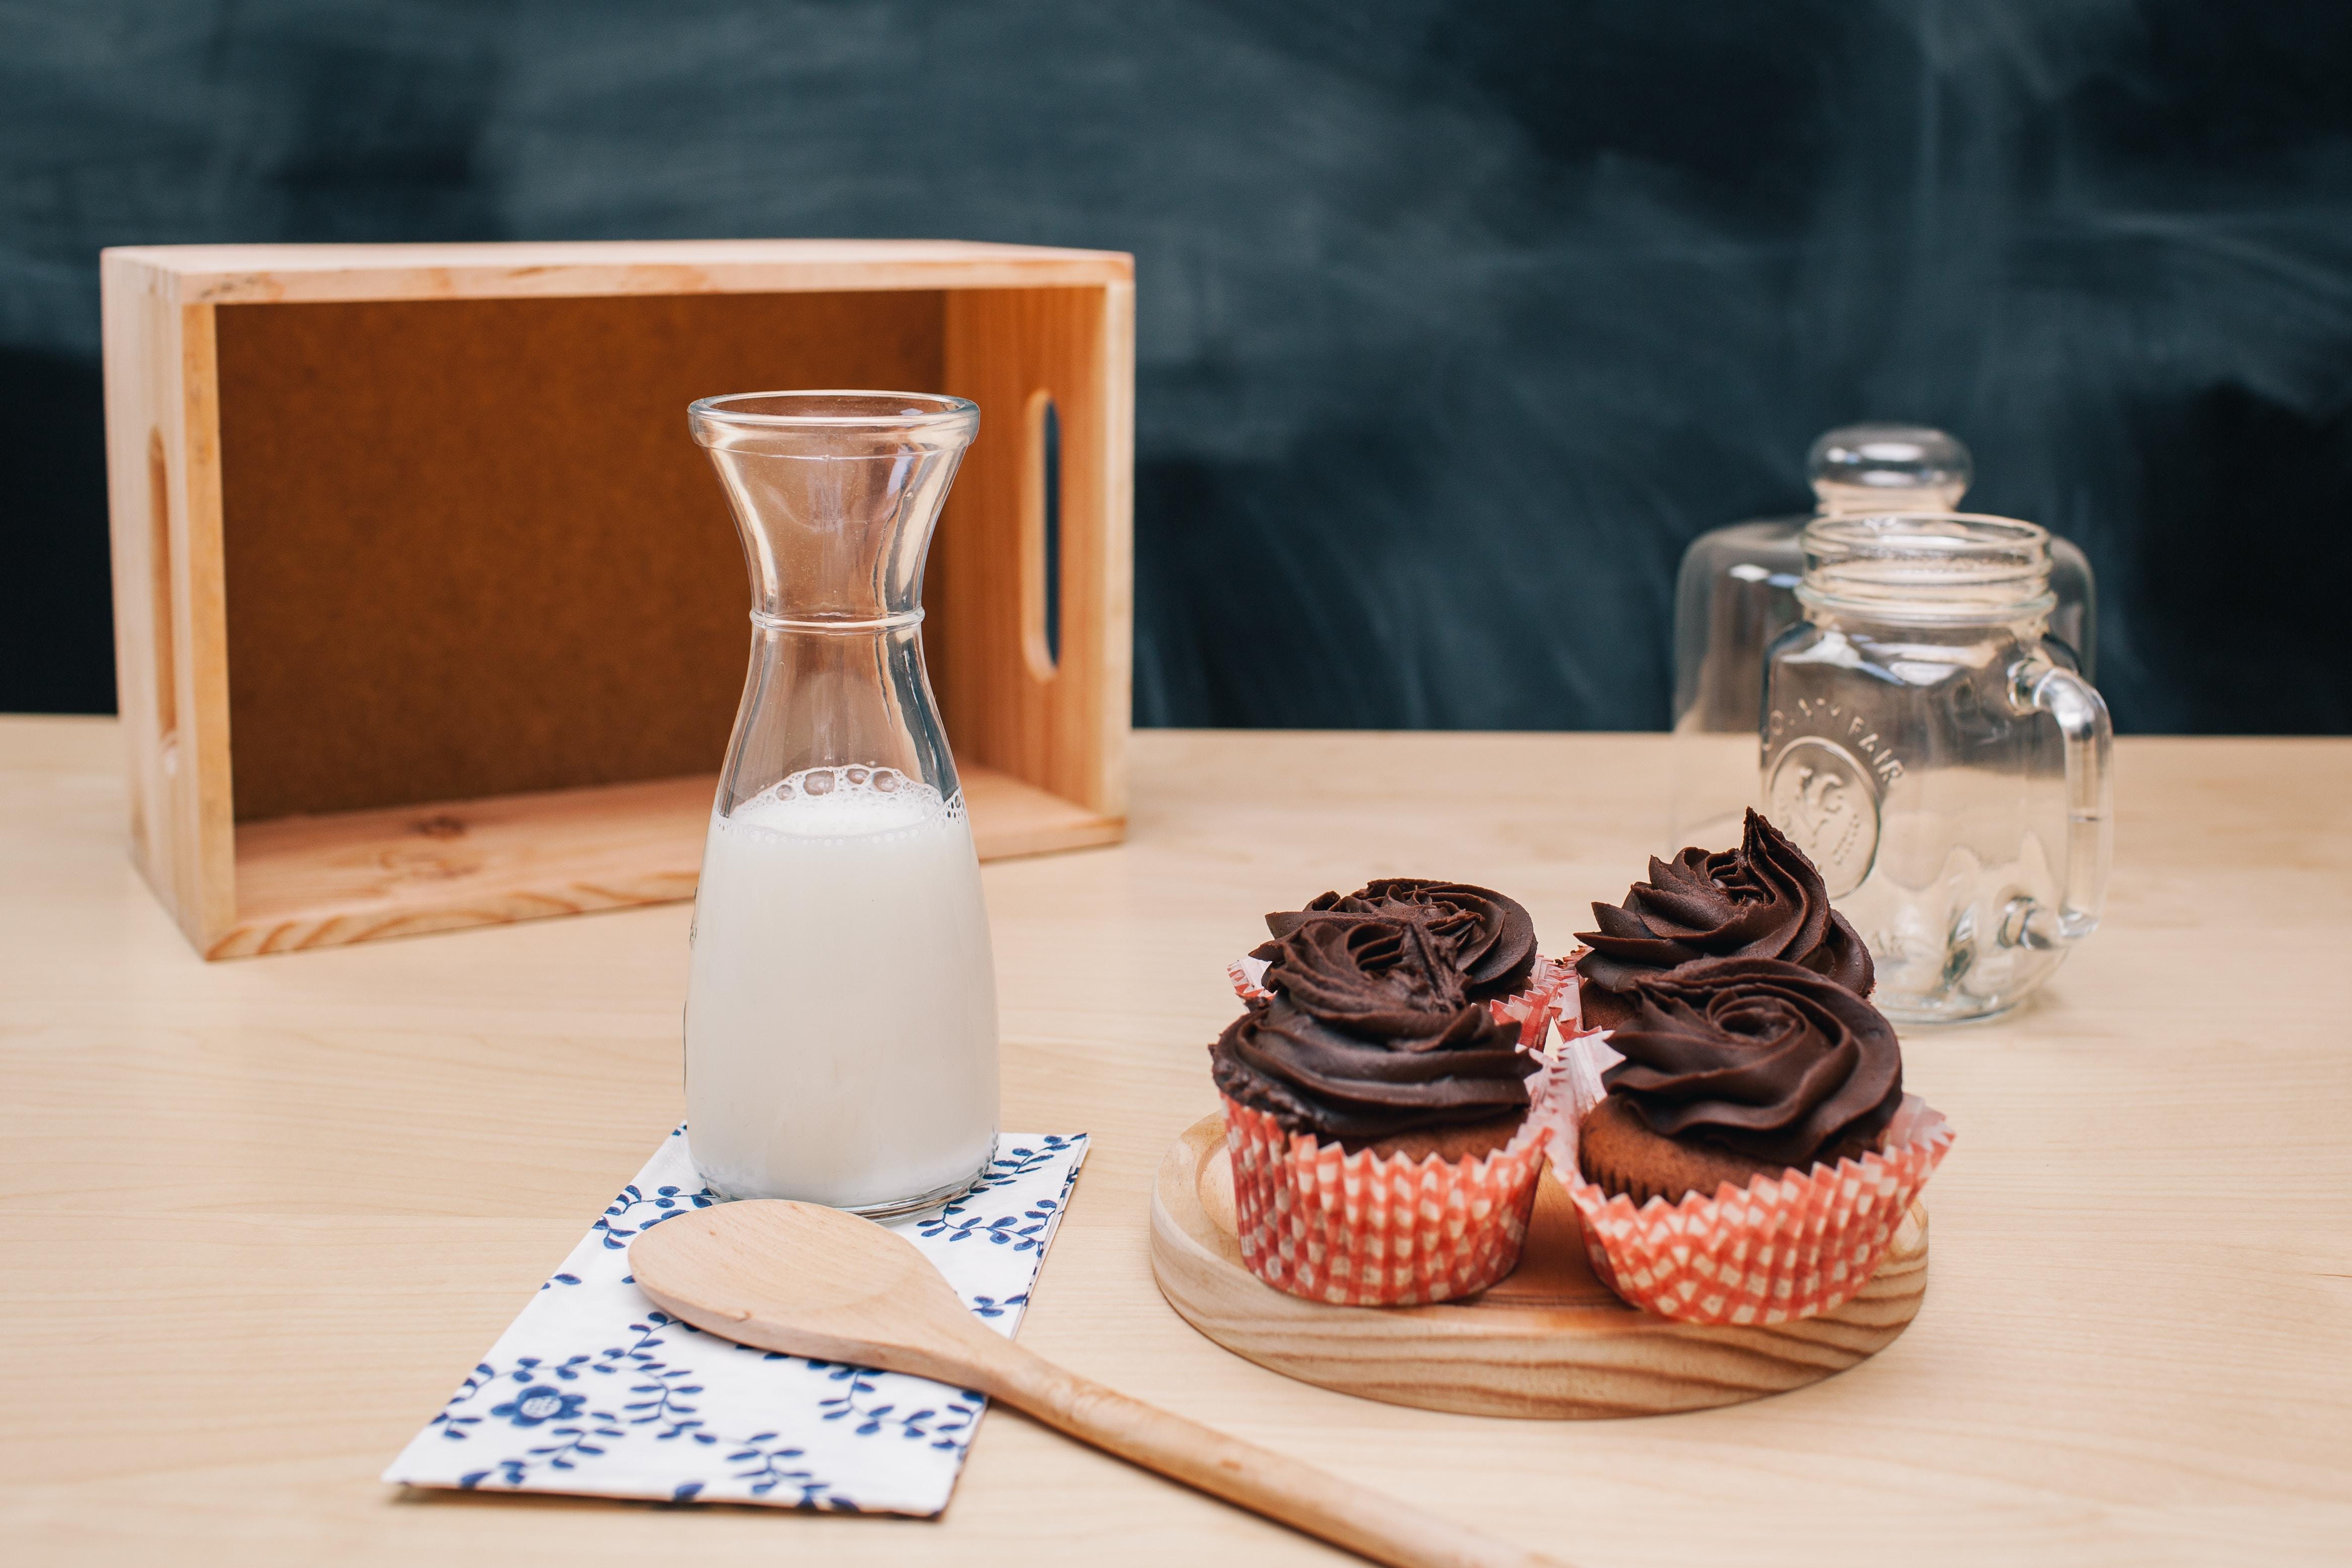 four cupcakes on brown coaster and milk jar